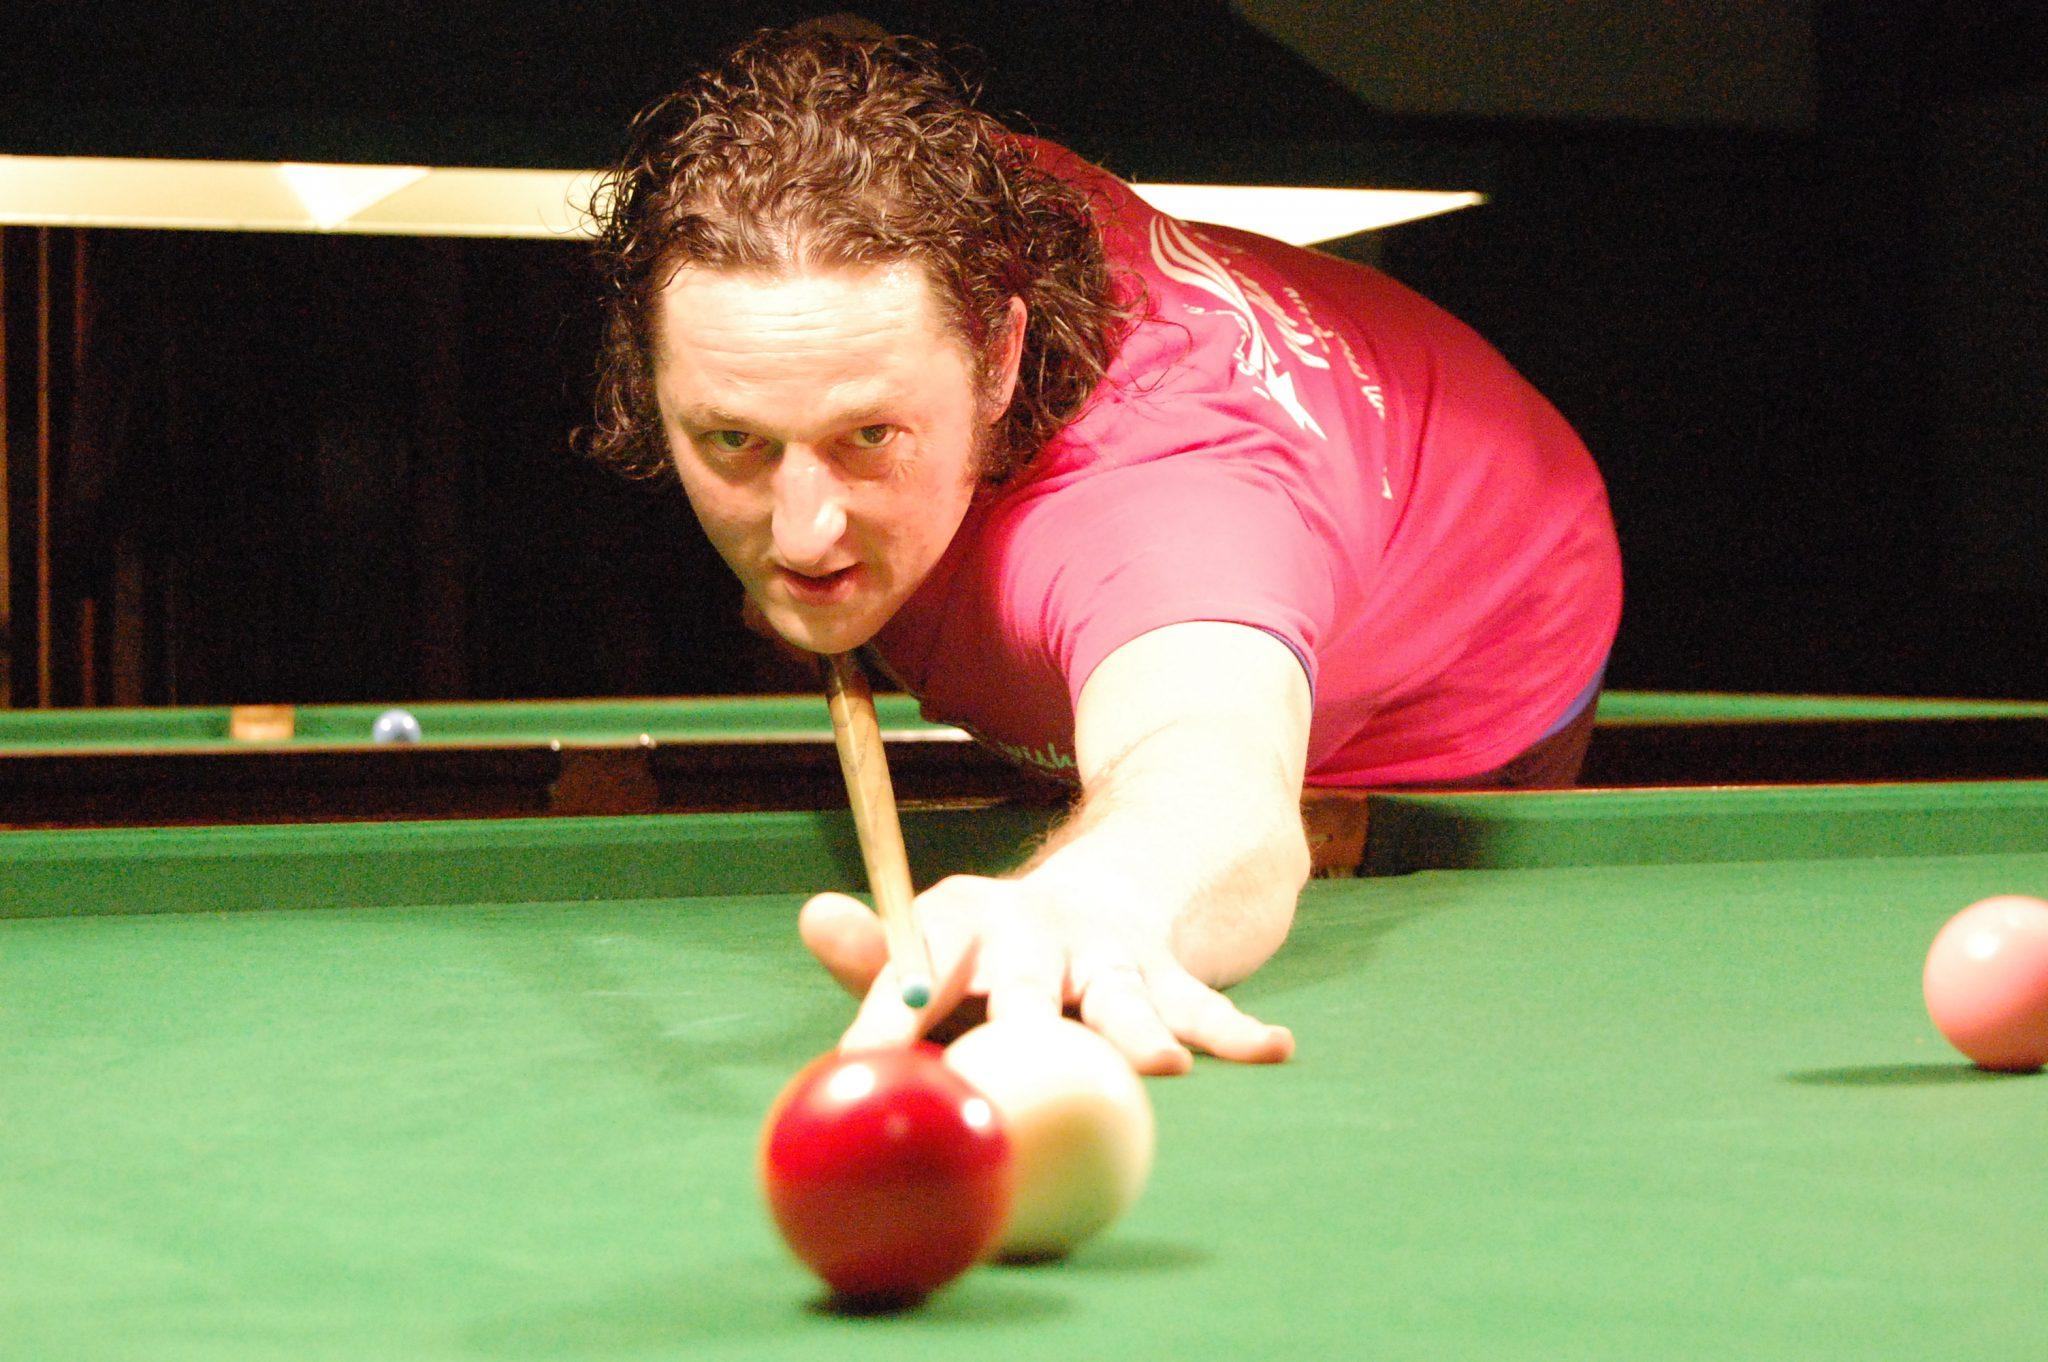 Steve wins black ball thriller at Cotgrave Welfare